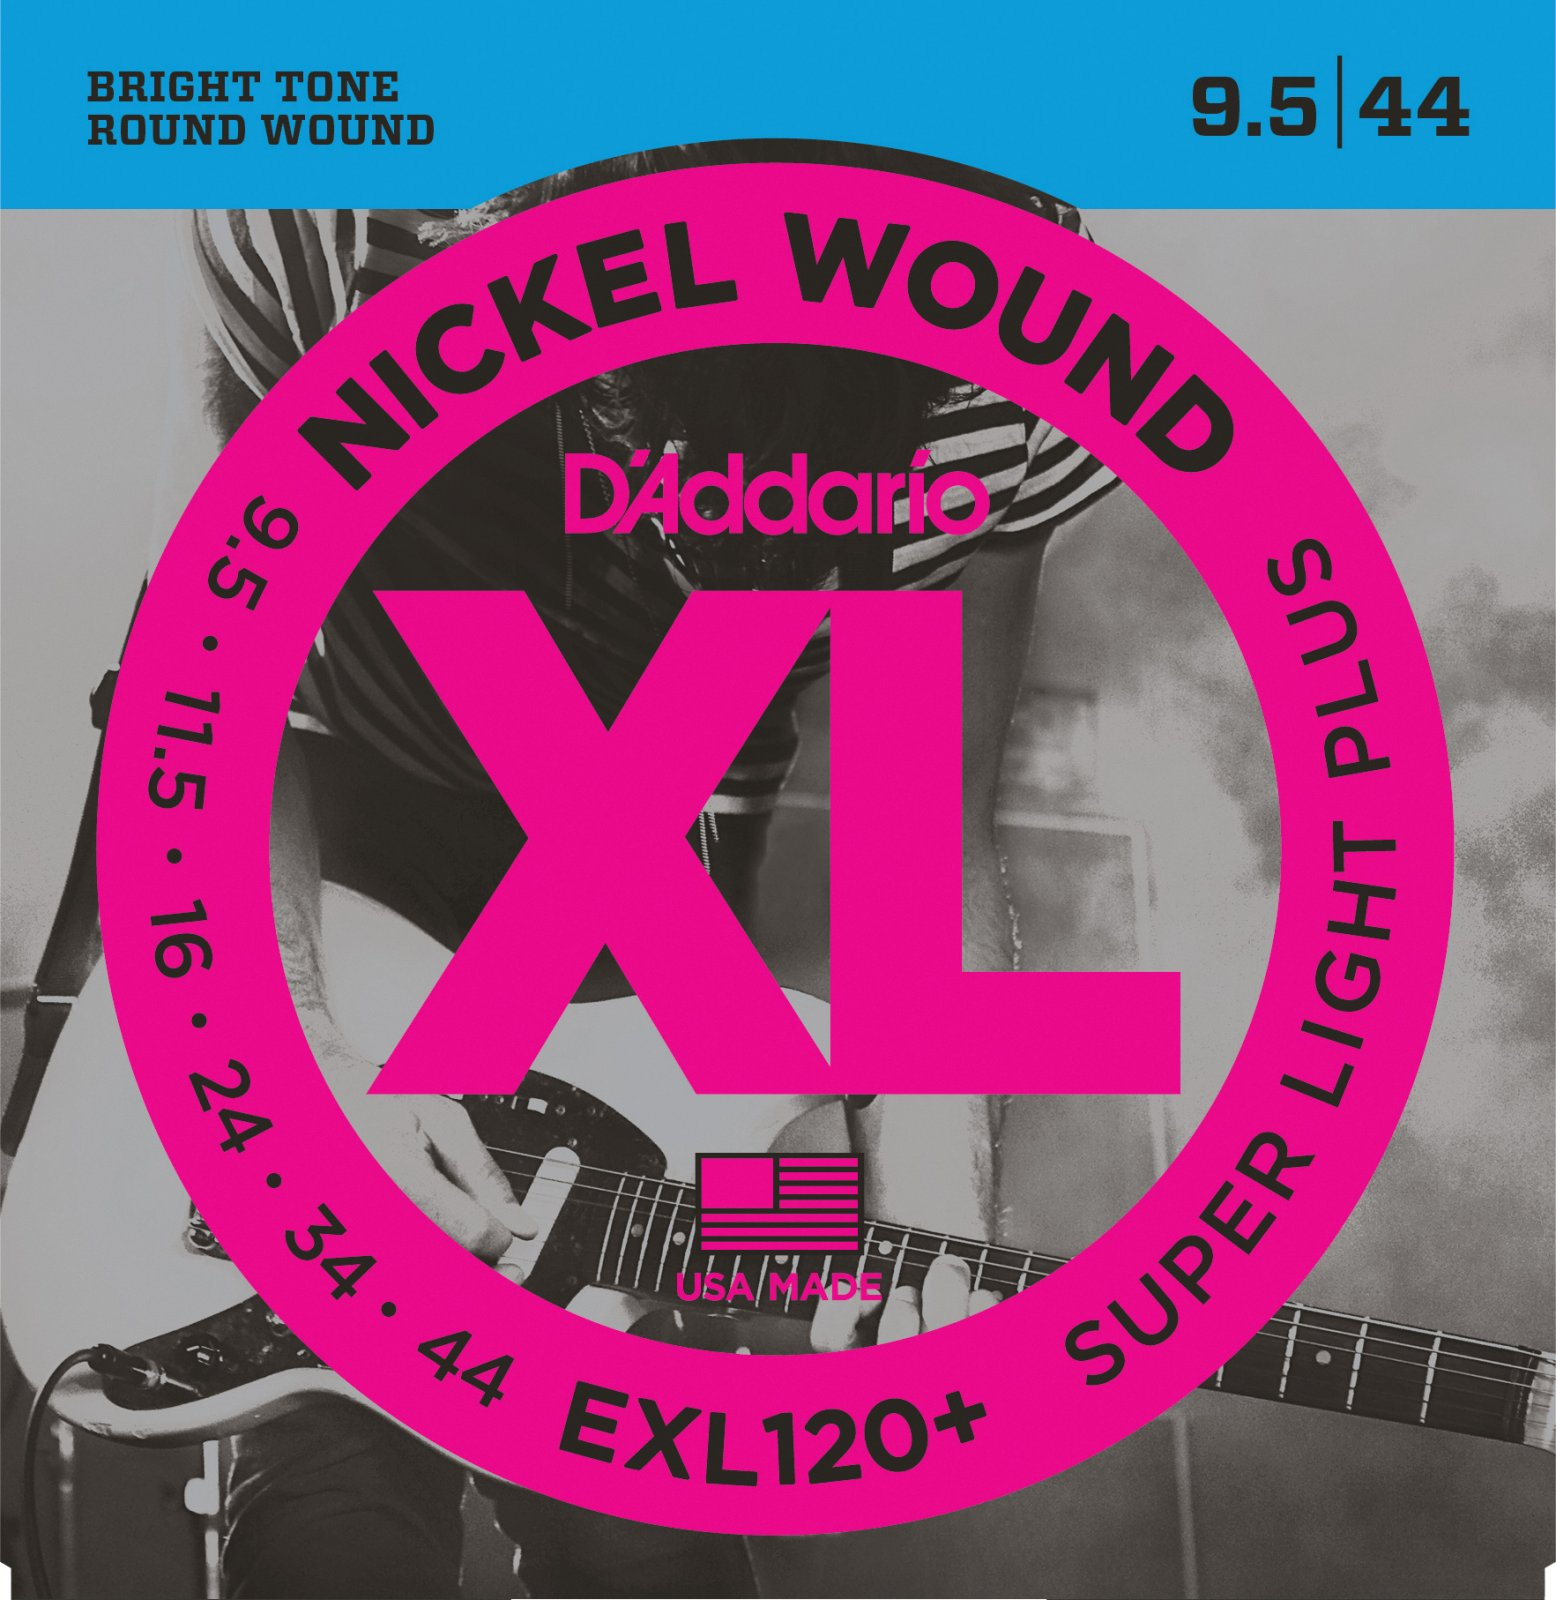 D'Addario EXL120+ Nickel Wound Electric Guitar Strings - Super Light Plus,  9.5-44